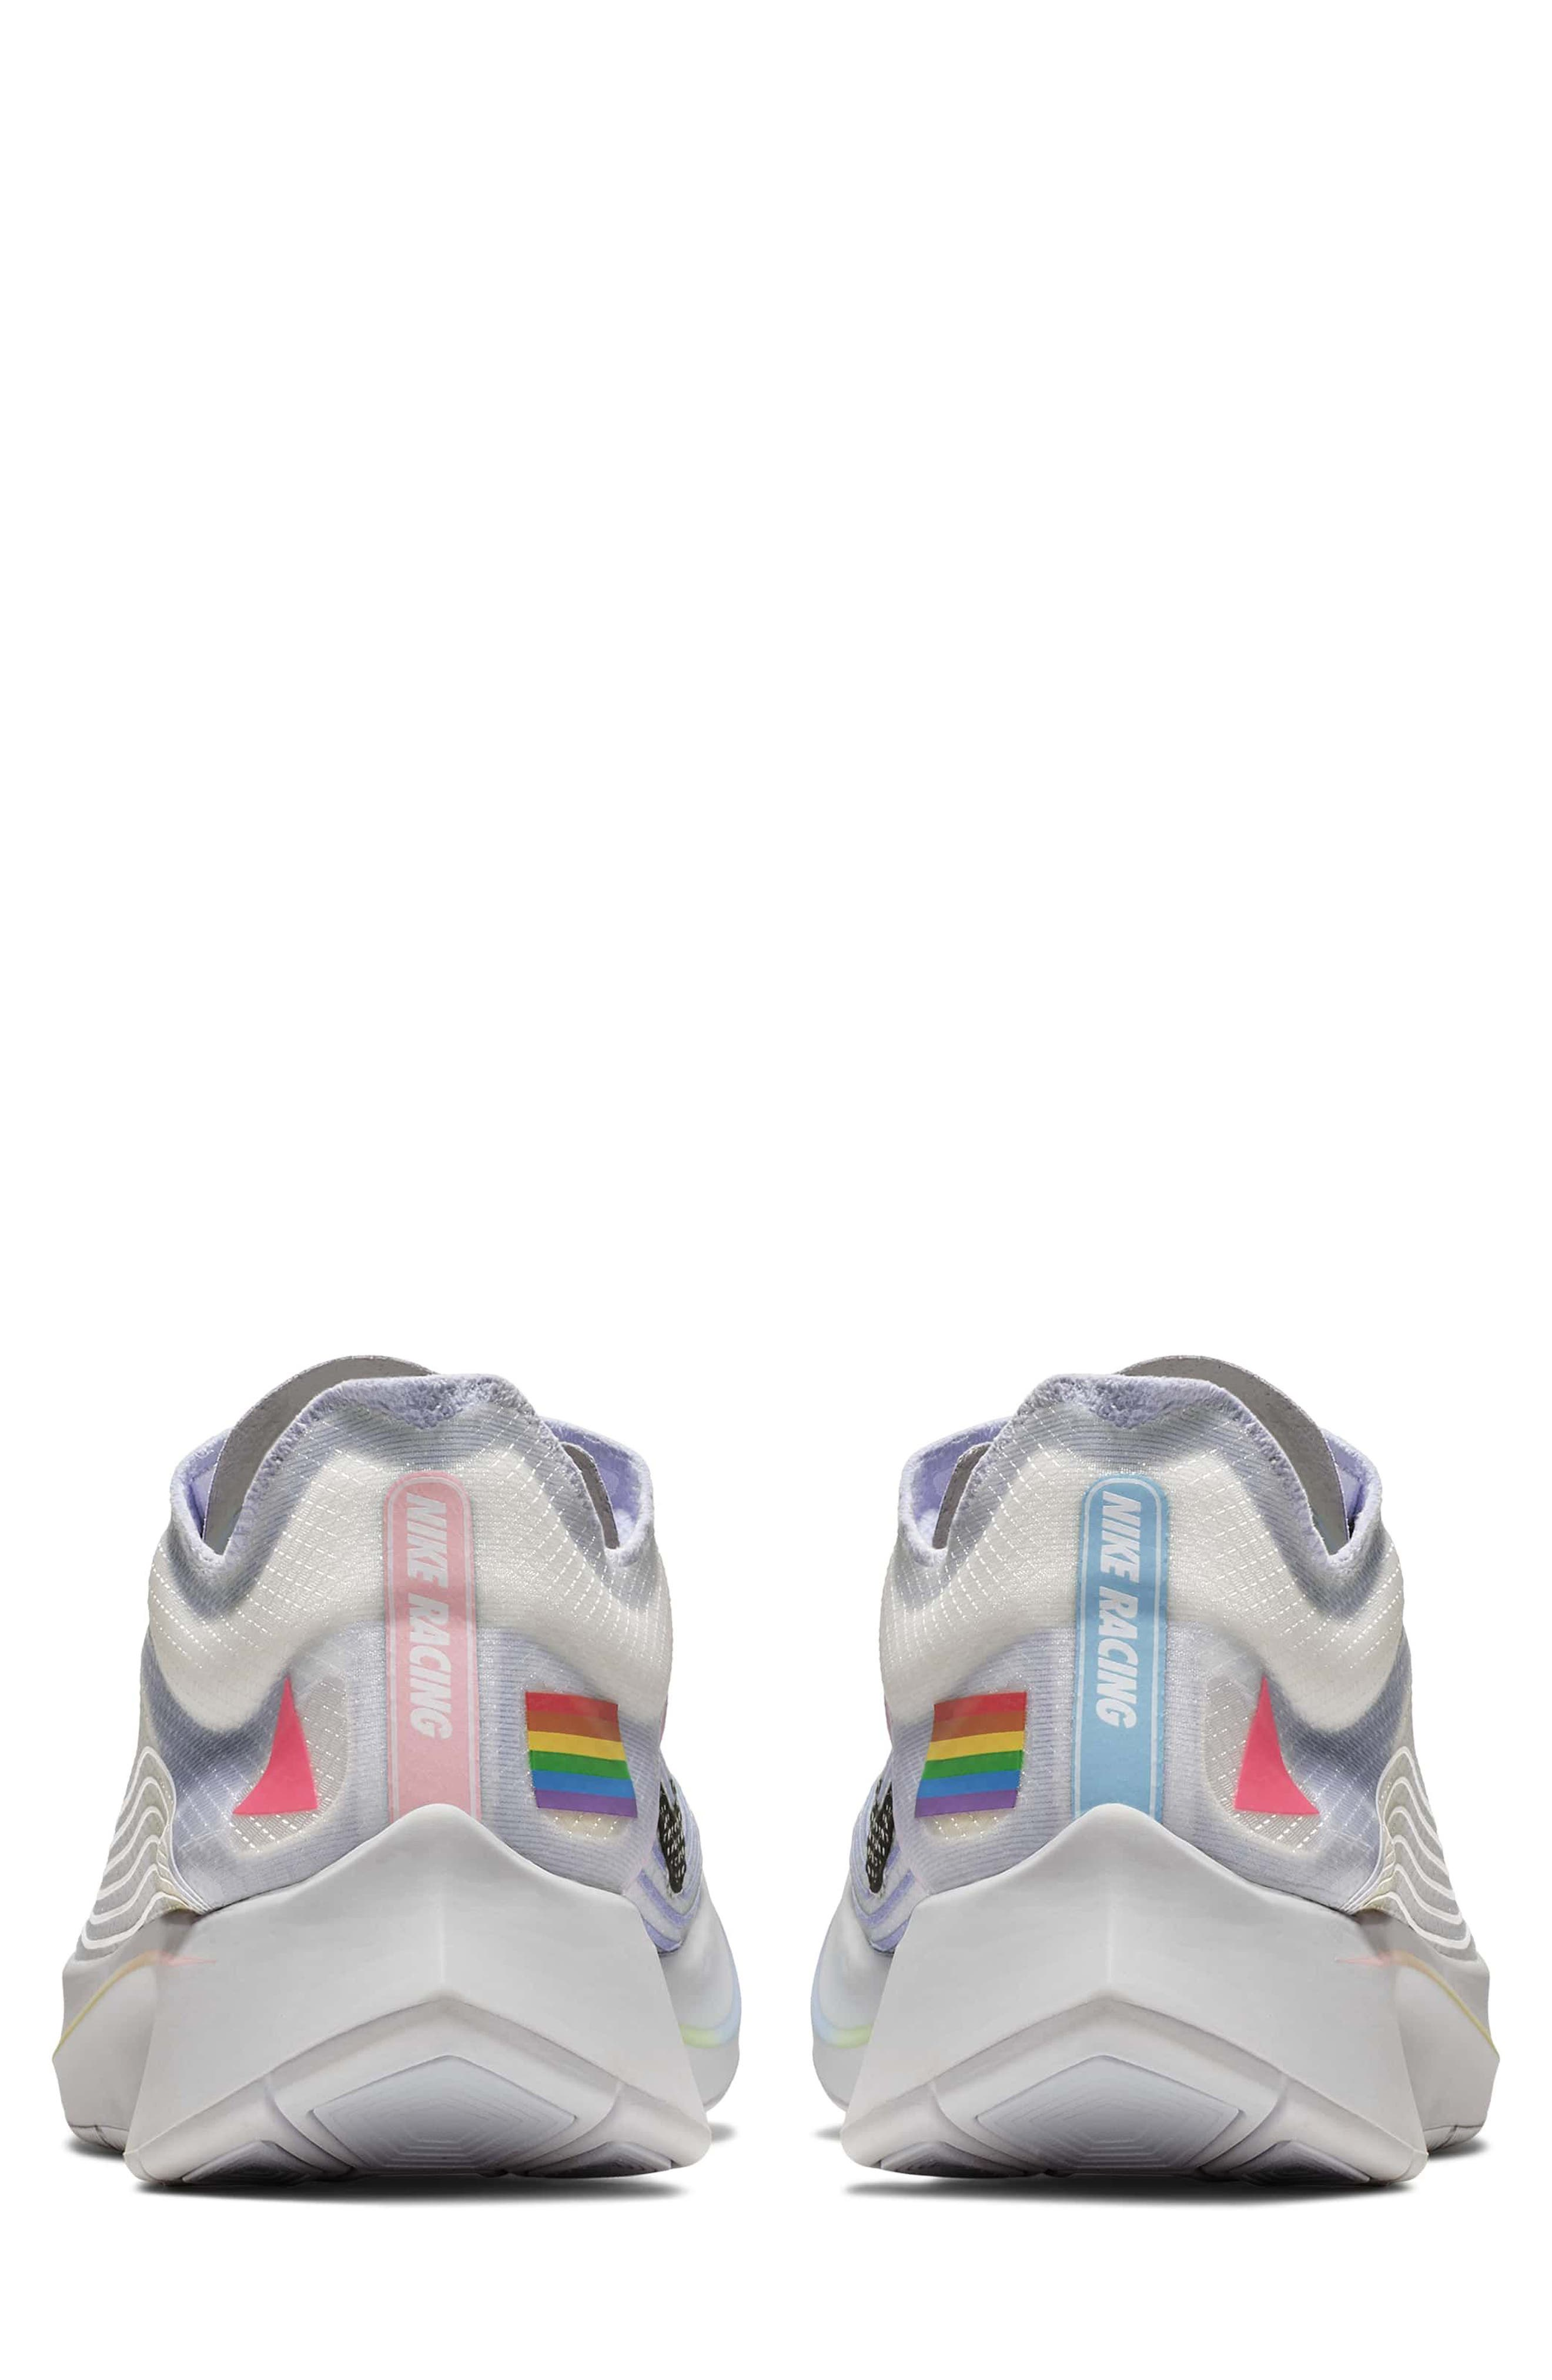 Nordstrom x Nike Zoom Fly BETRUE Running Shoe,                             Alternate thumbnail 2, color,                             White/ Black/ Palest Purple